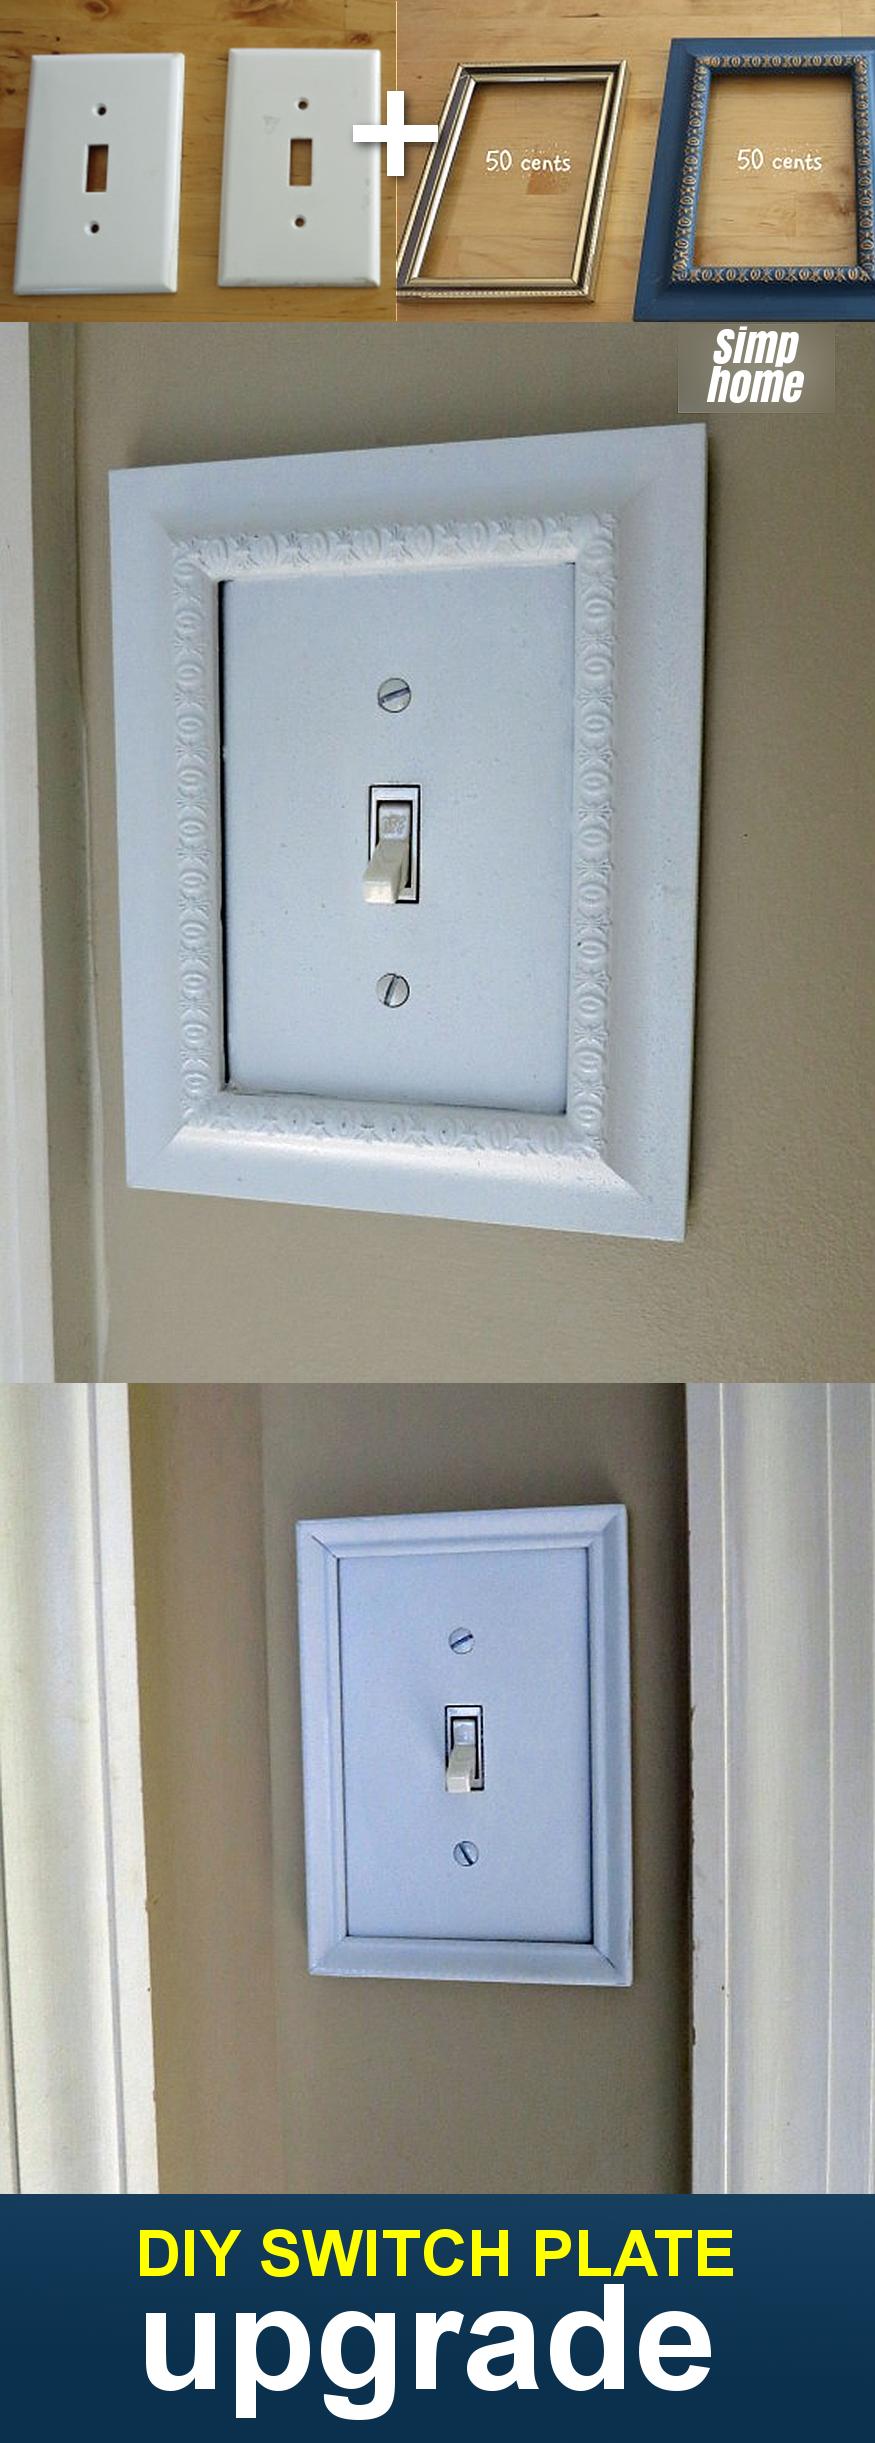 DIY switch plate upgrade via simphome com Finished